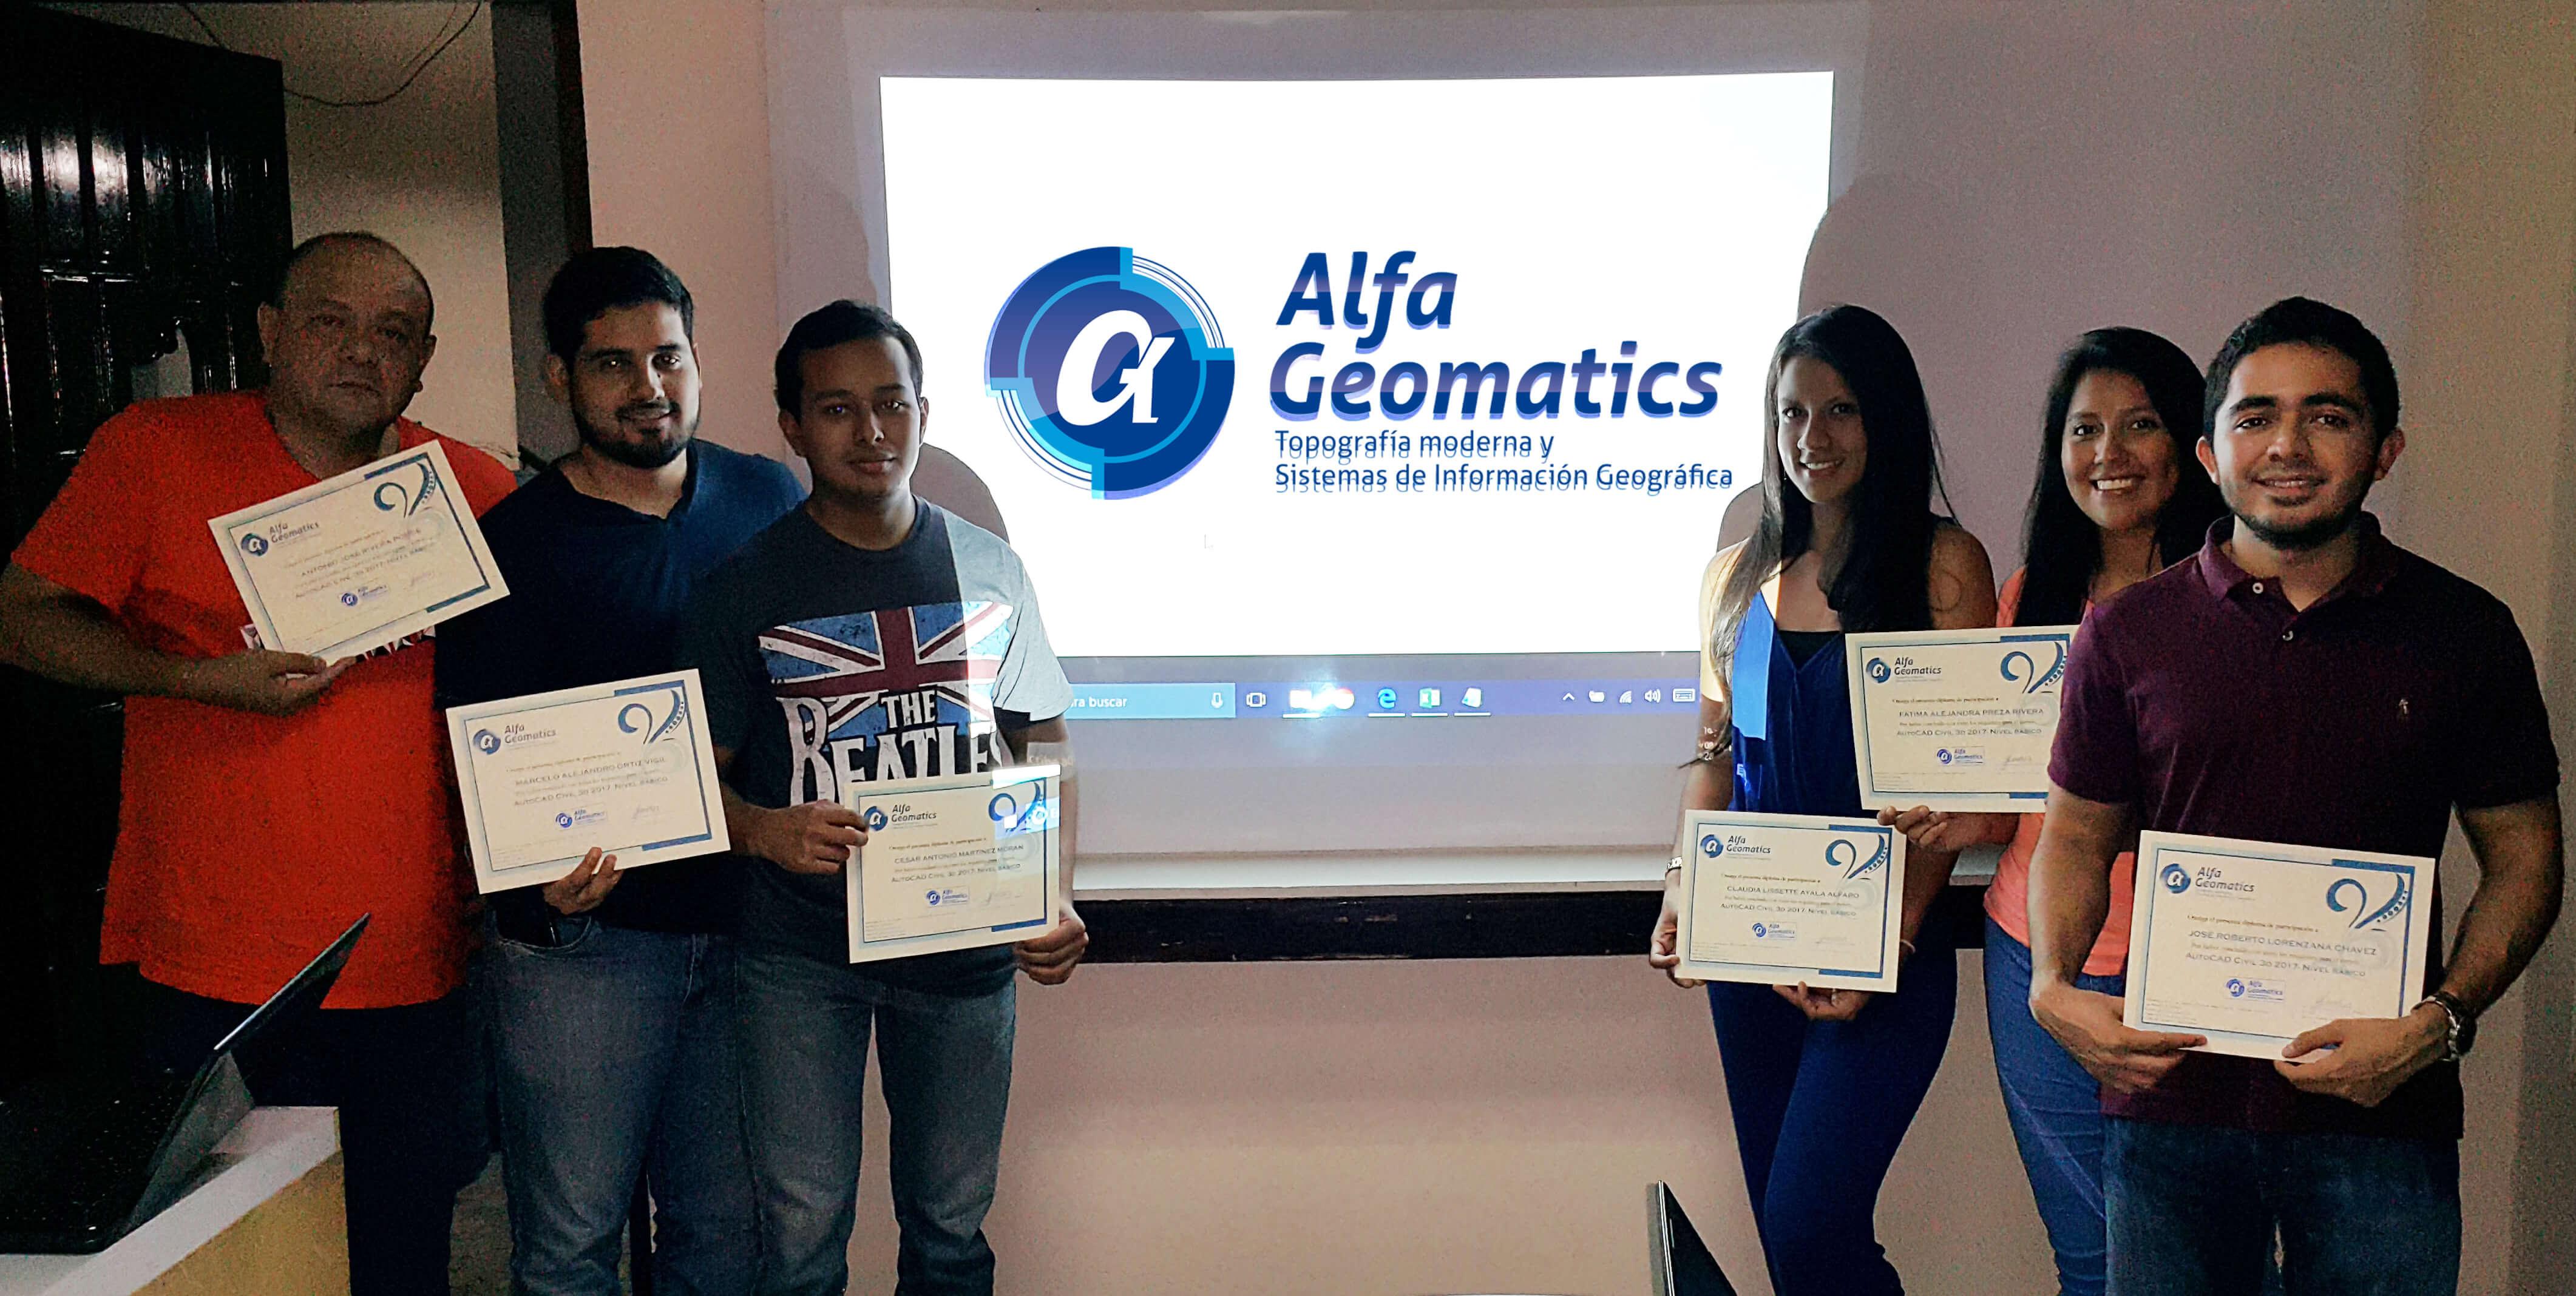 Curso de AutoCAD Alfa Geomatics